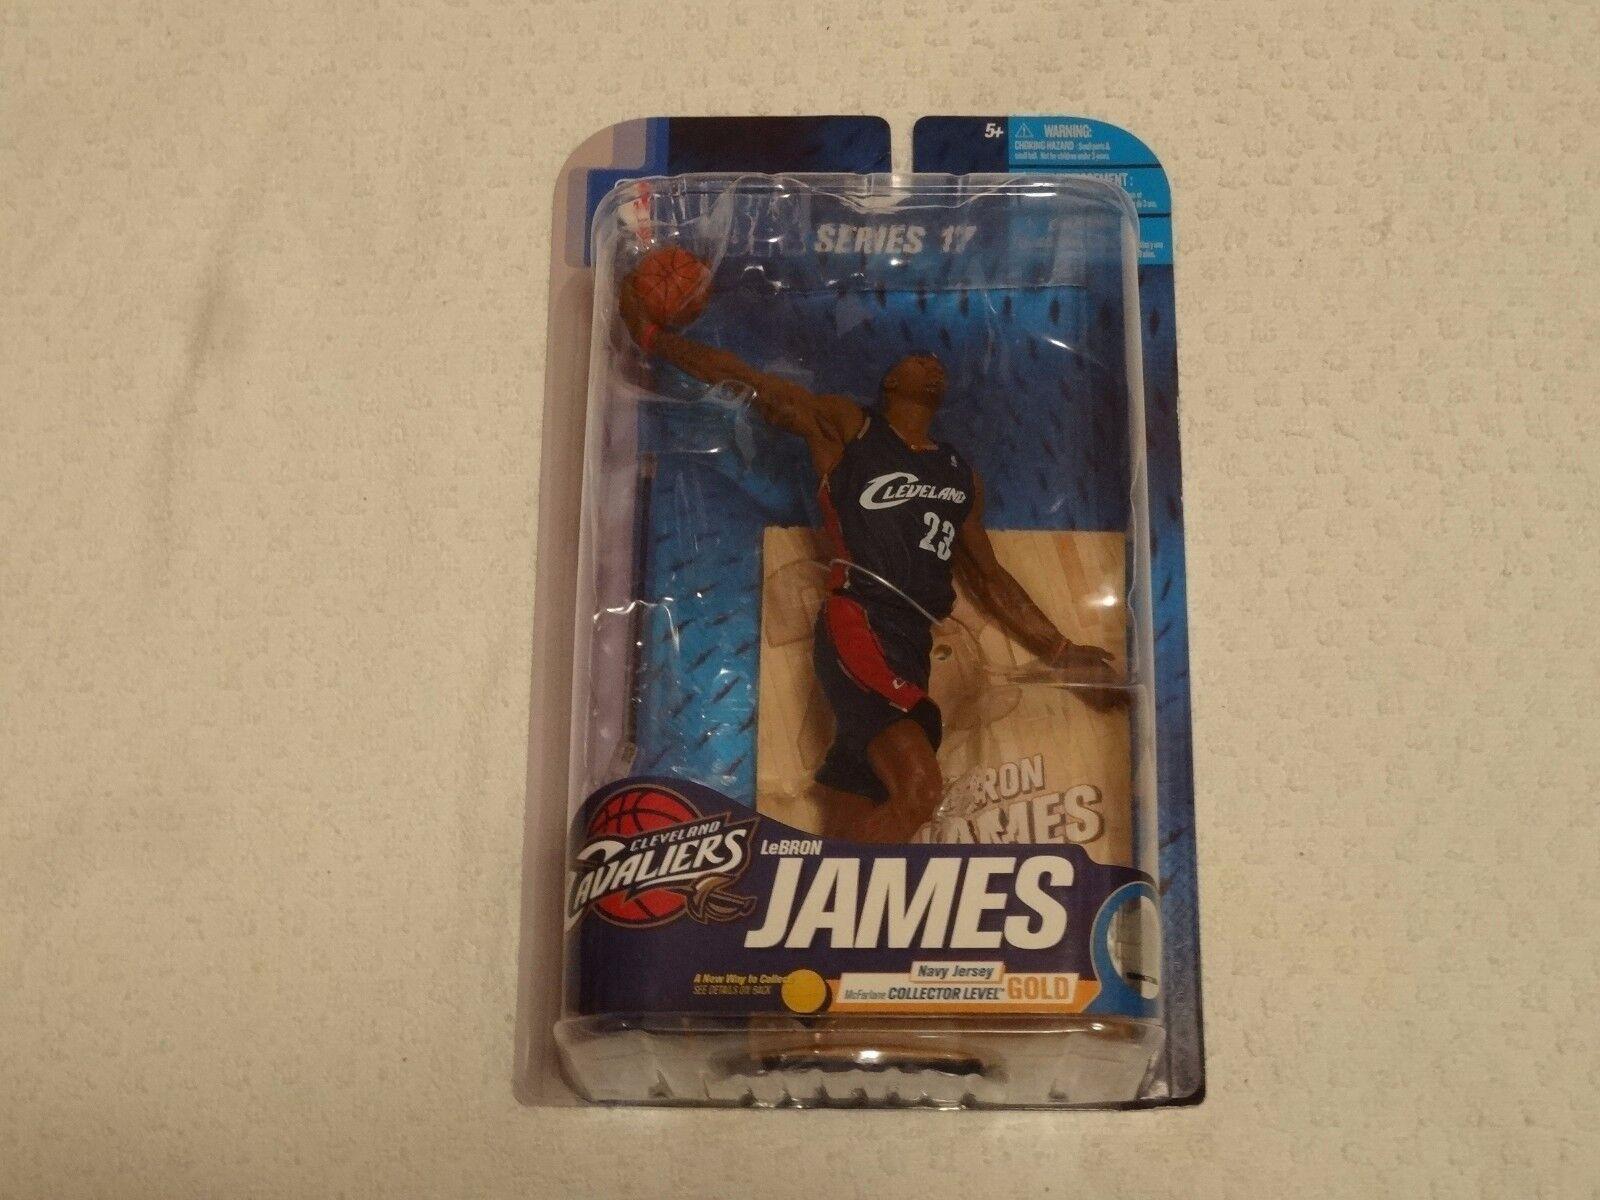 MCFARLANE NBA Series 17 Lebron James or niveau Chase variante bleu marine  156 500